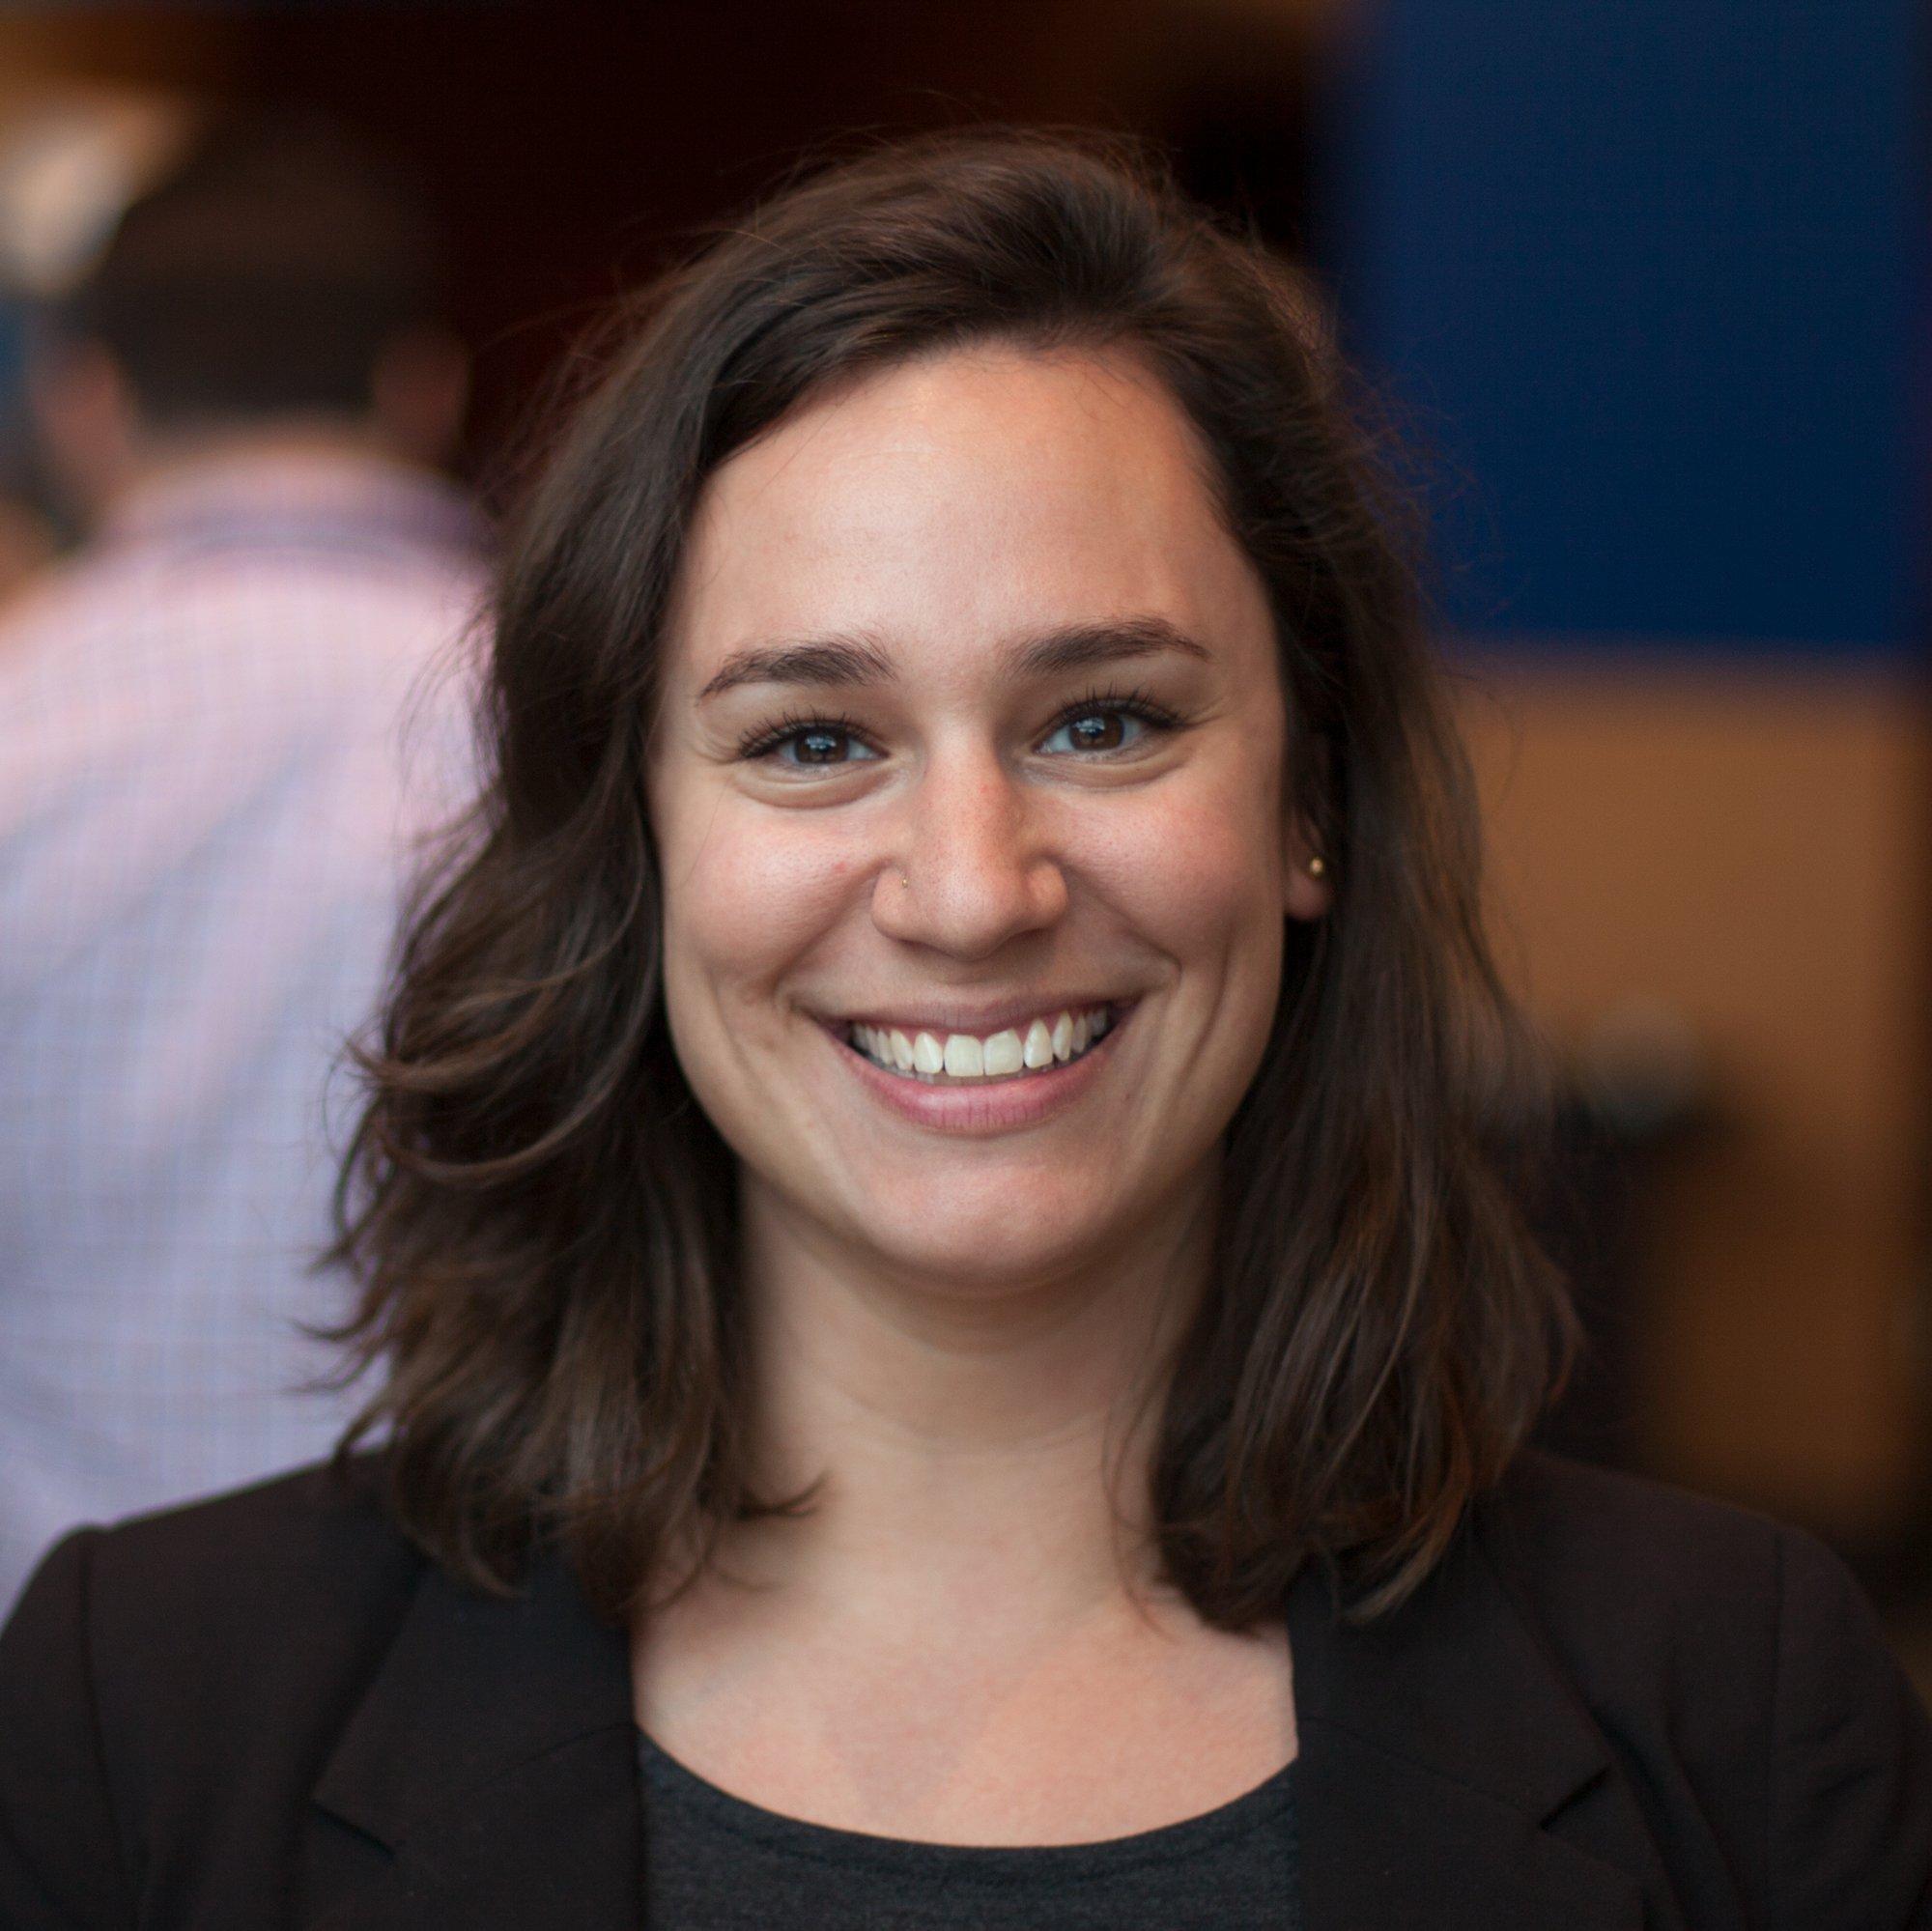 Claire Diener Profile Photo